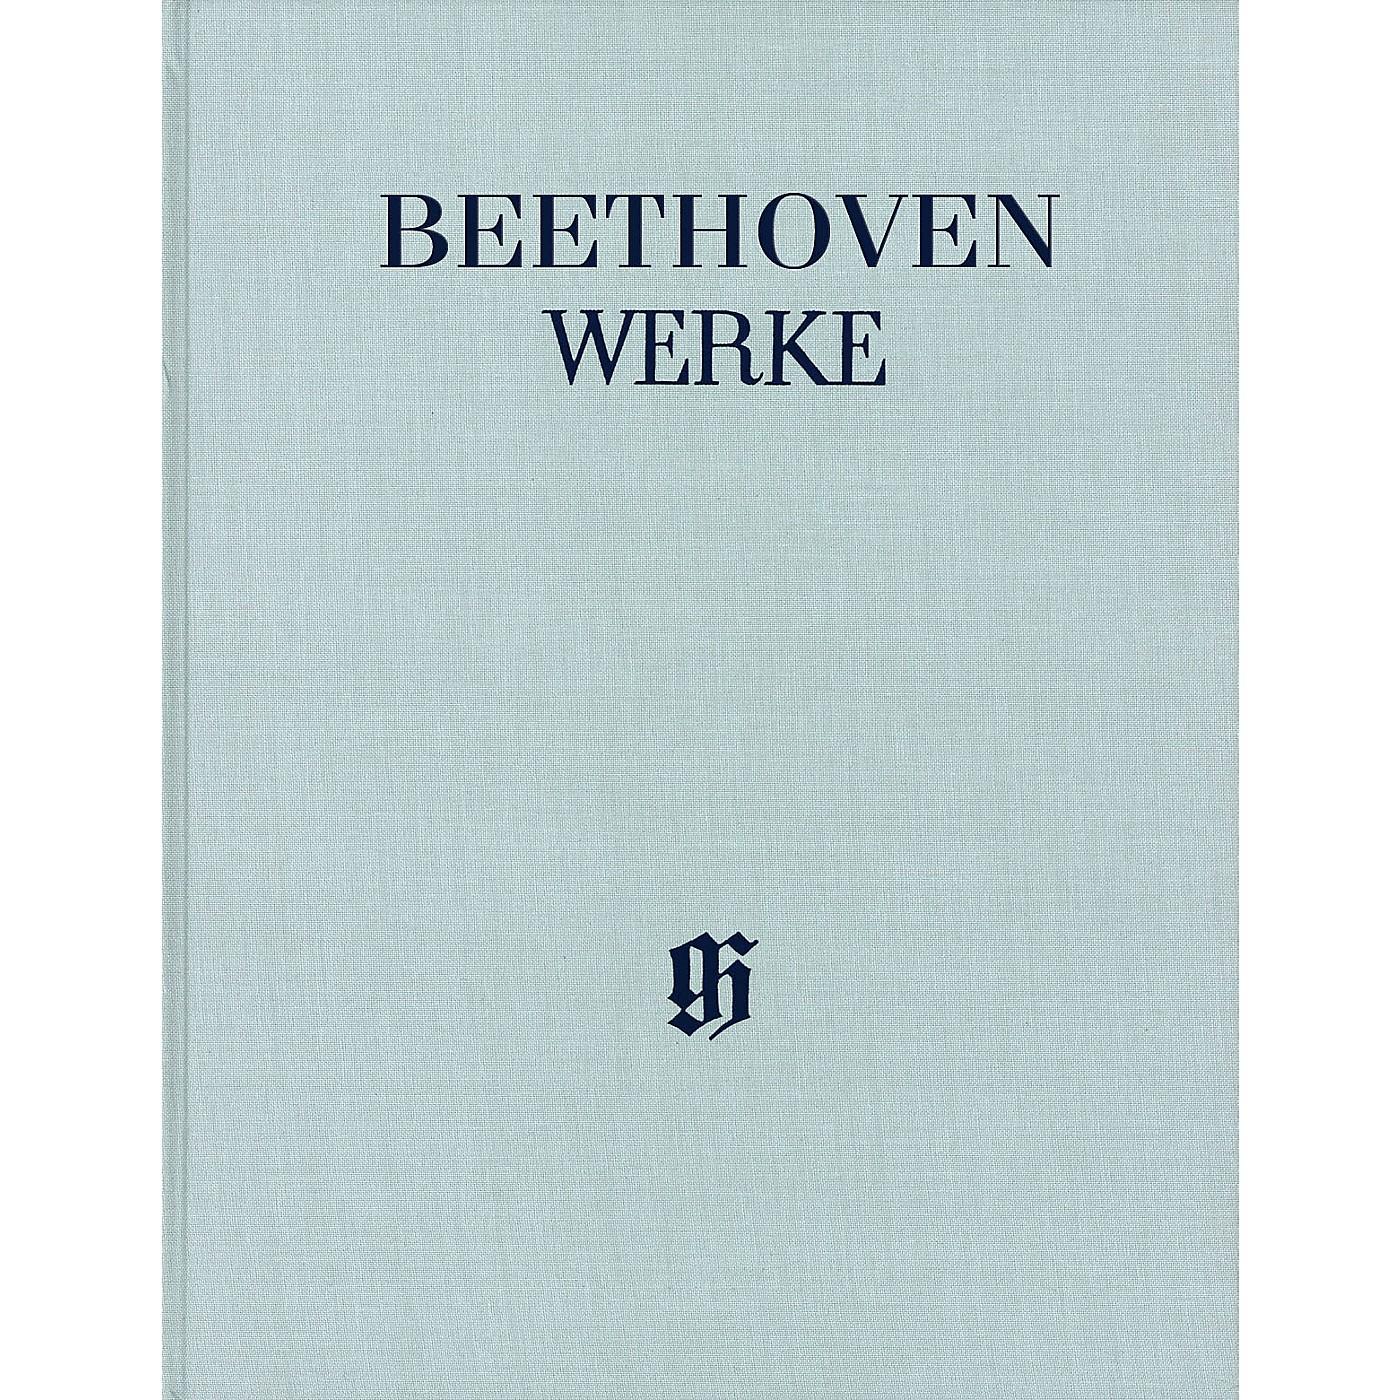 G. Henle Verlag Christus am Ölberge Op. 85 (Hardcover Edition) Score Composed by Ludwig van Beethoven thumbnail